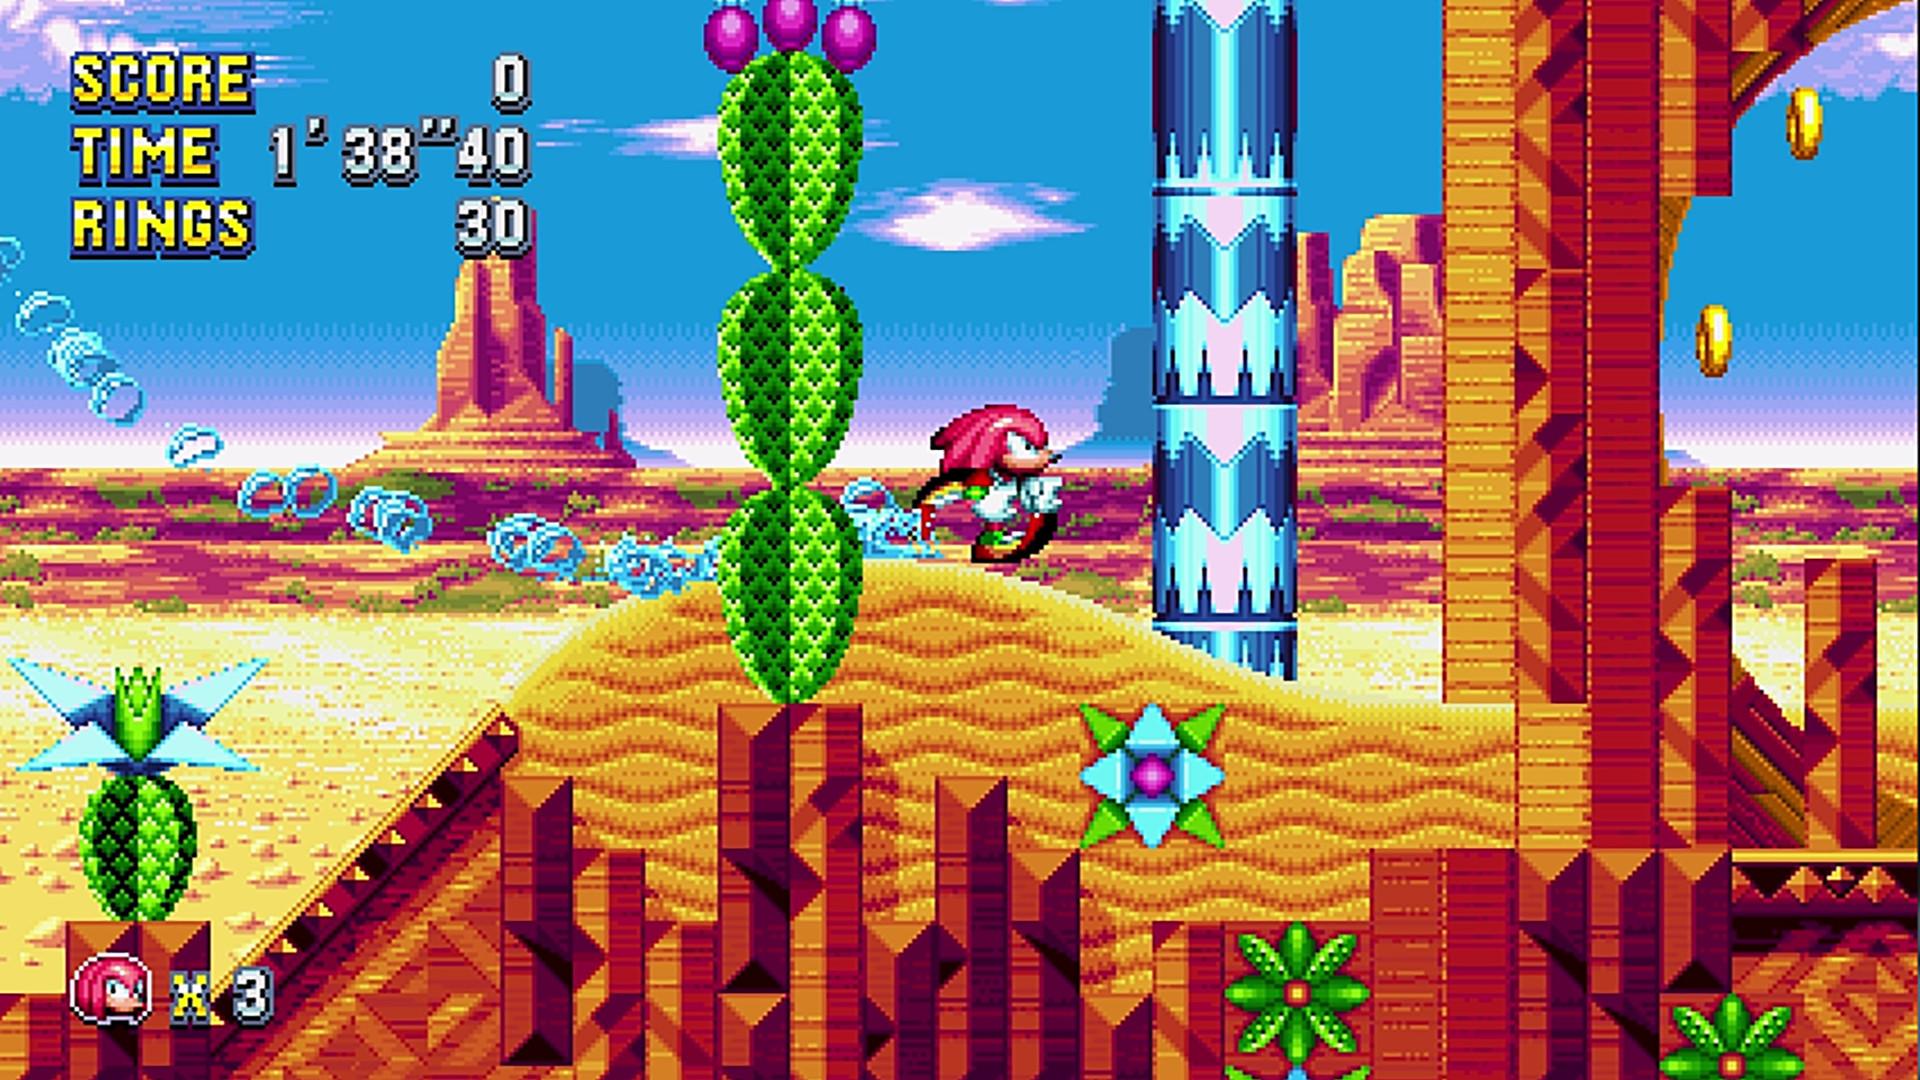 Sonic Mania Screenshot 1